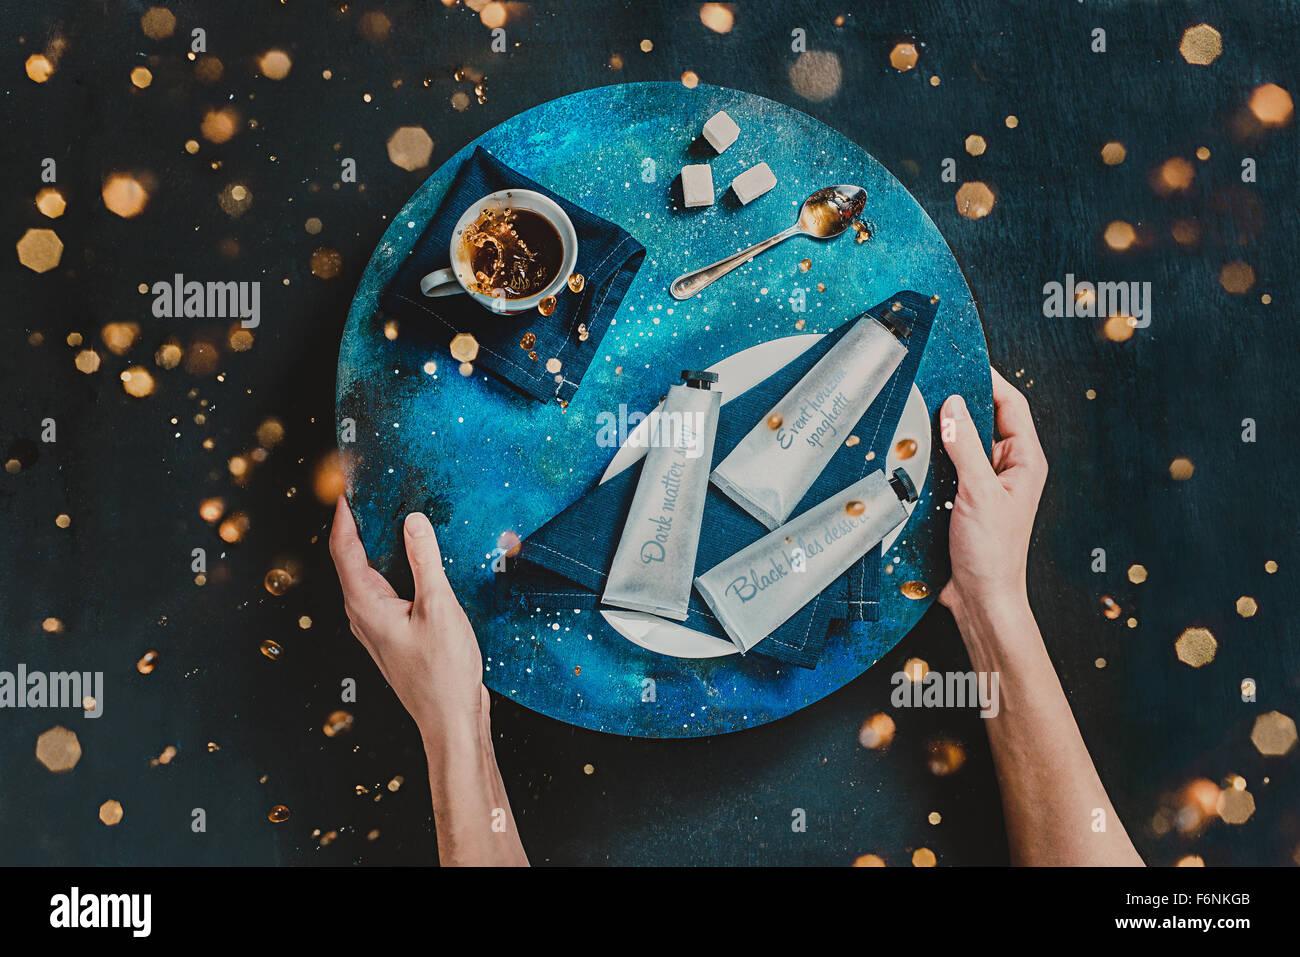 Zero gravity lunch - Stock Image